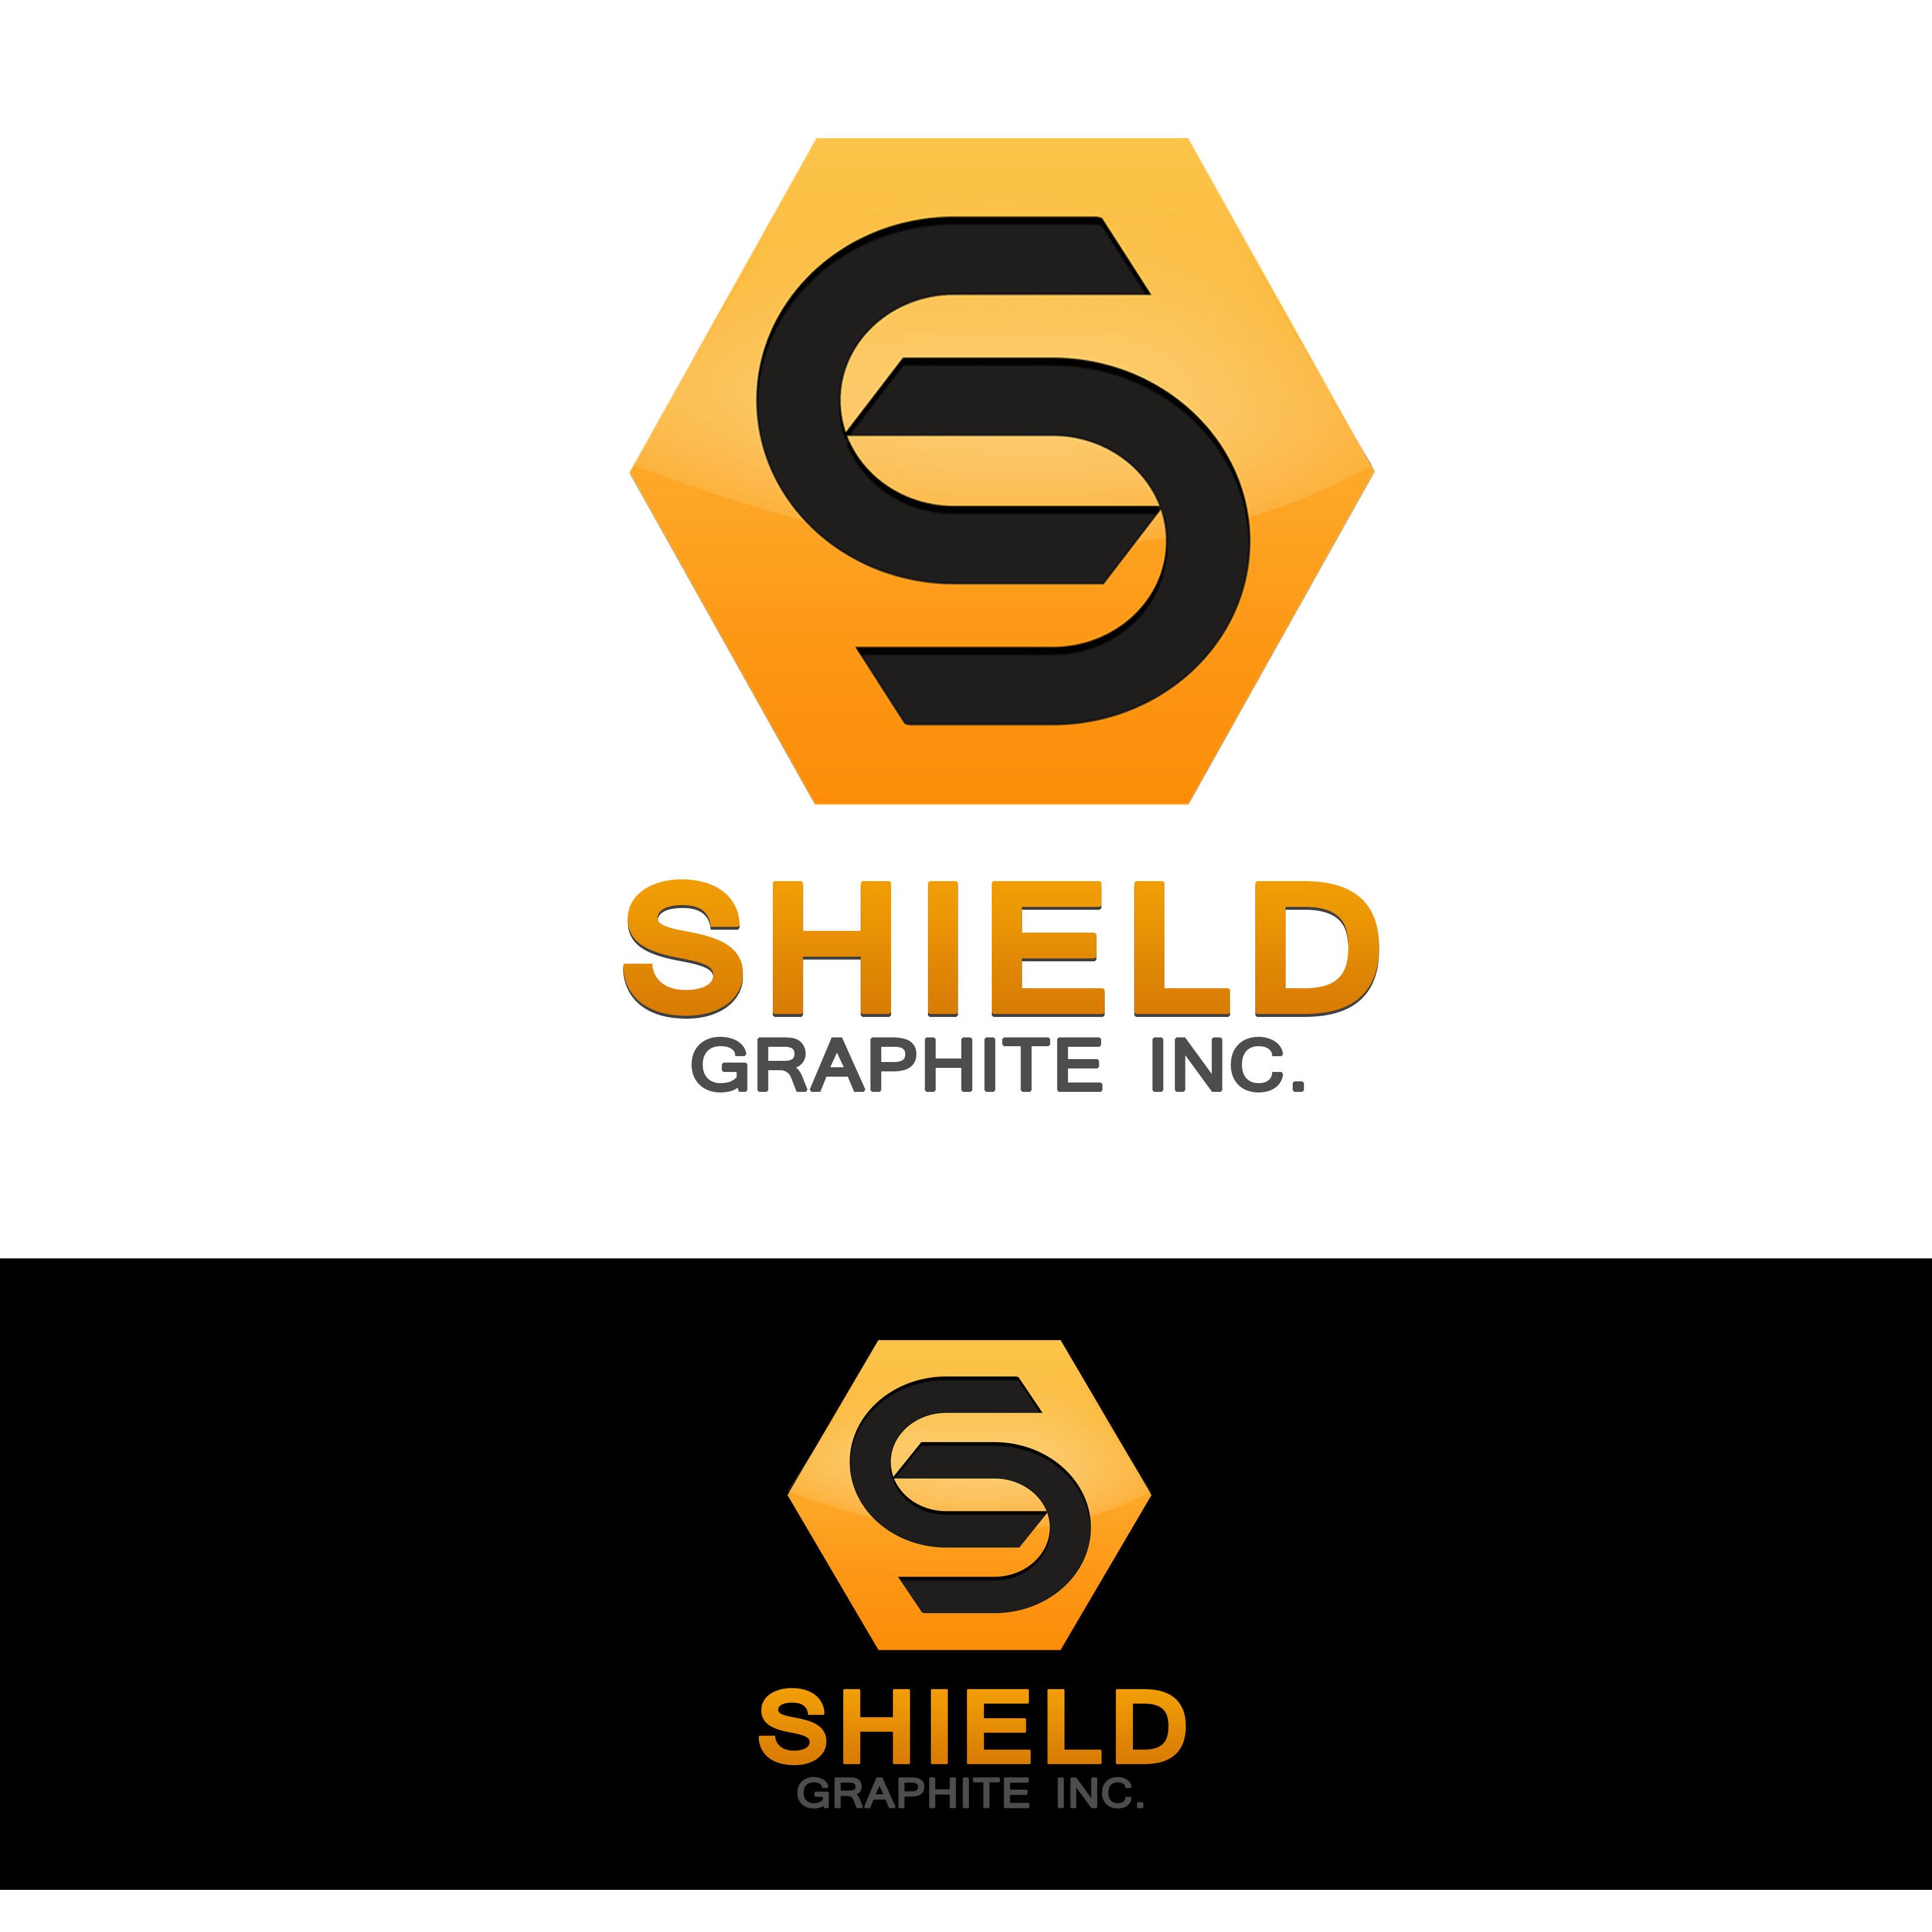 Logo Design by Allan Esclamado - Entry No. 118 in the Logo Design Contest Imaginative Logo Design for Shield Graphite Inc..